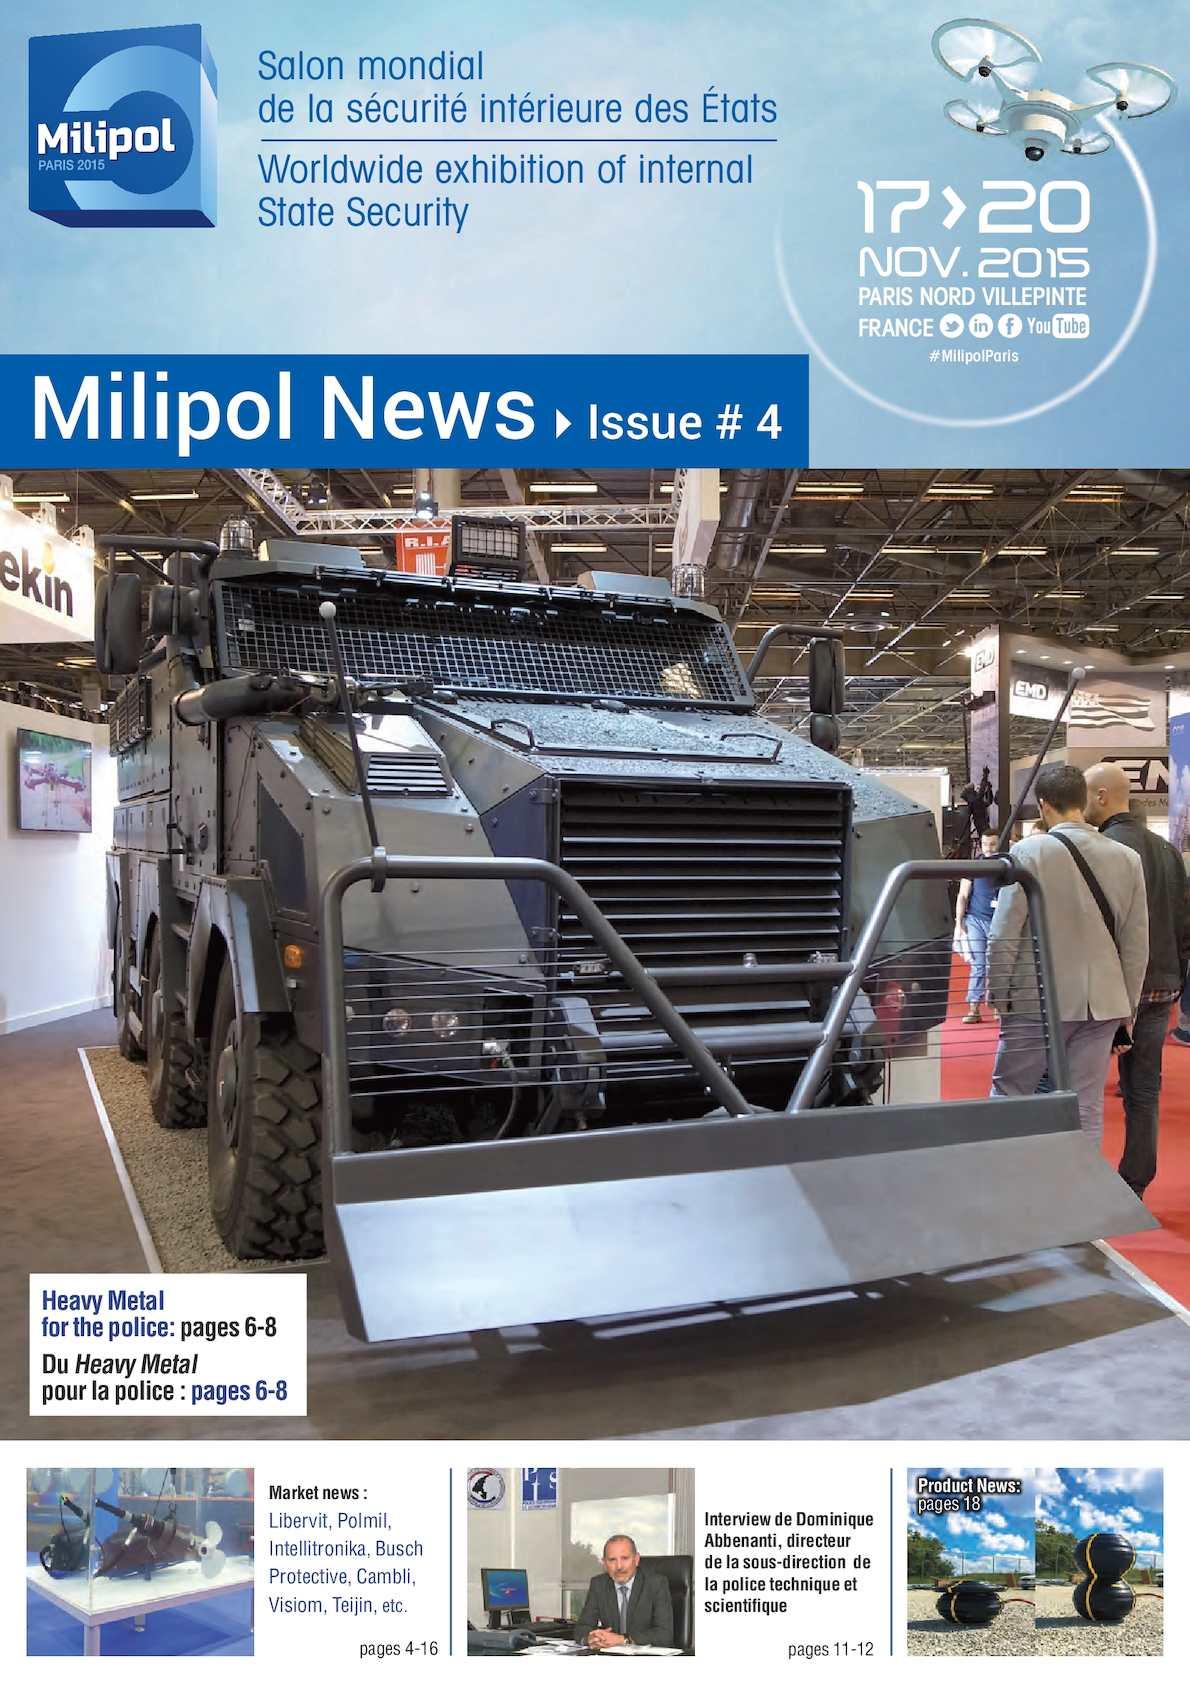 Calam o milipol 2015 daily news 04 for Salon milipol